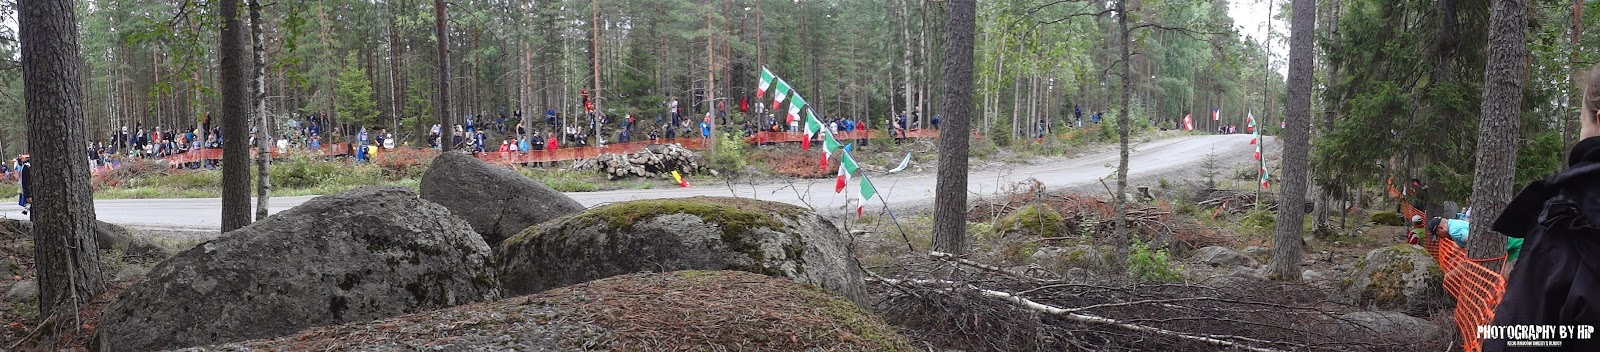 Rajd Finlandii 2013